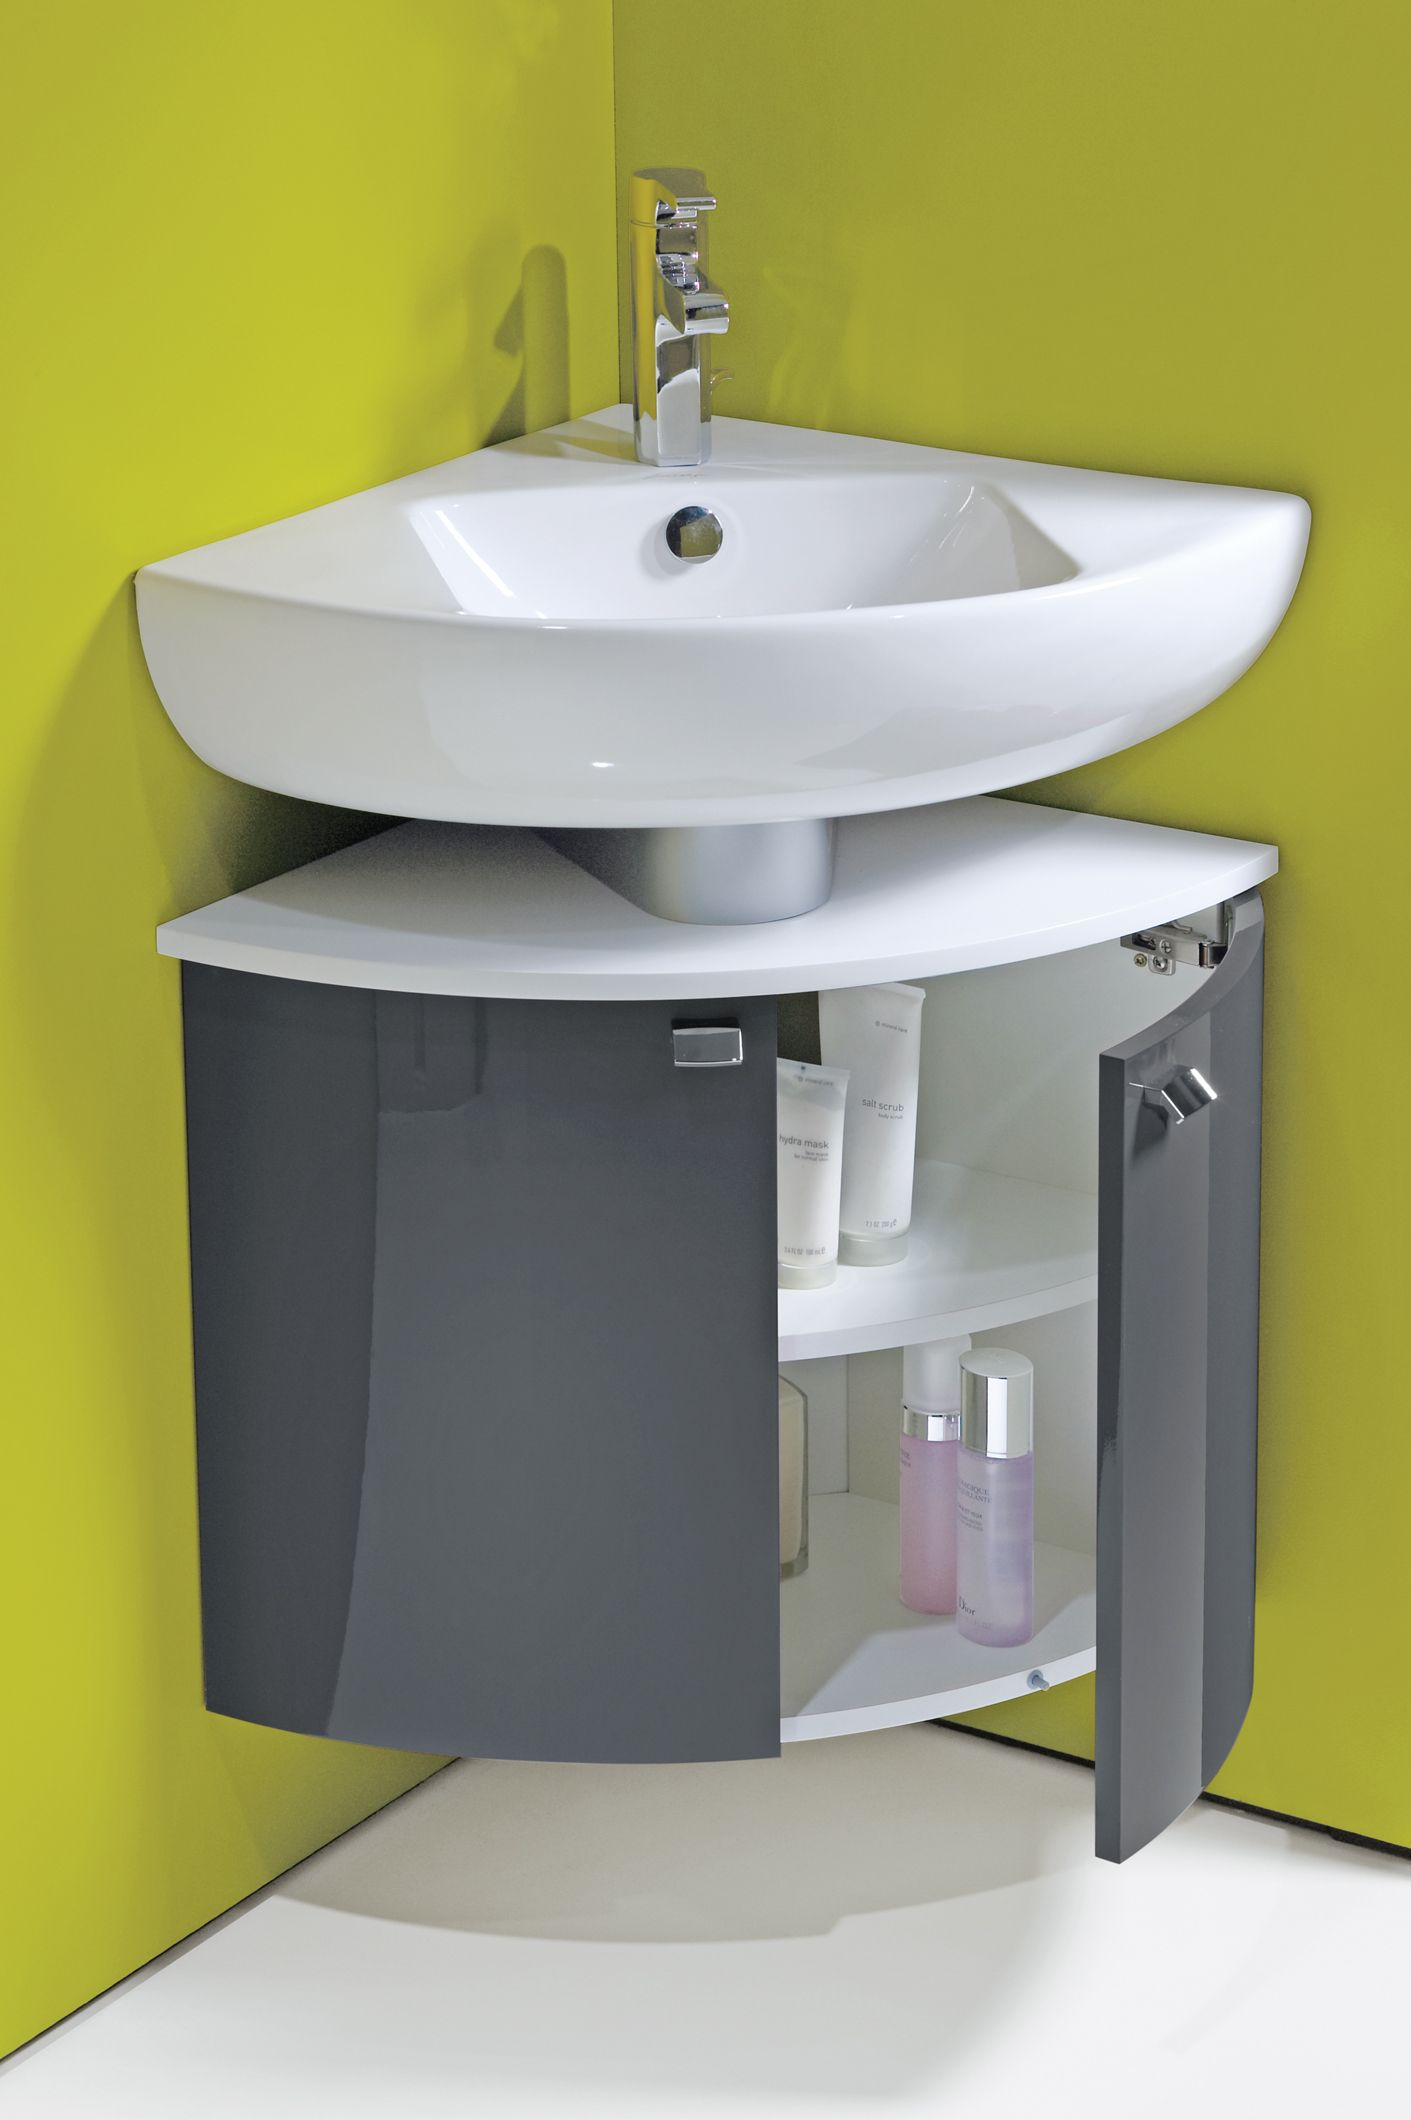 Reach Bathroom Suites Washbasin Design Wash Basin Corner Toilet